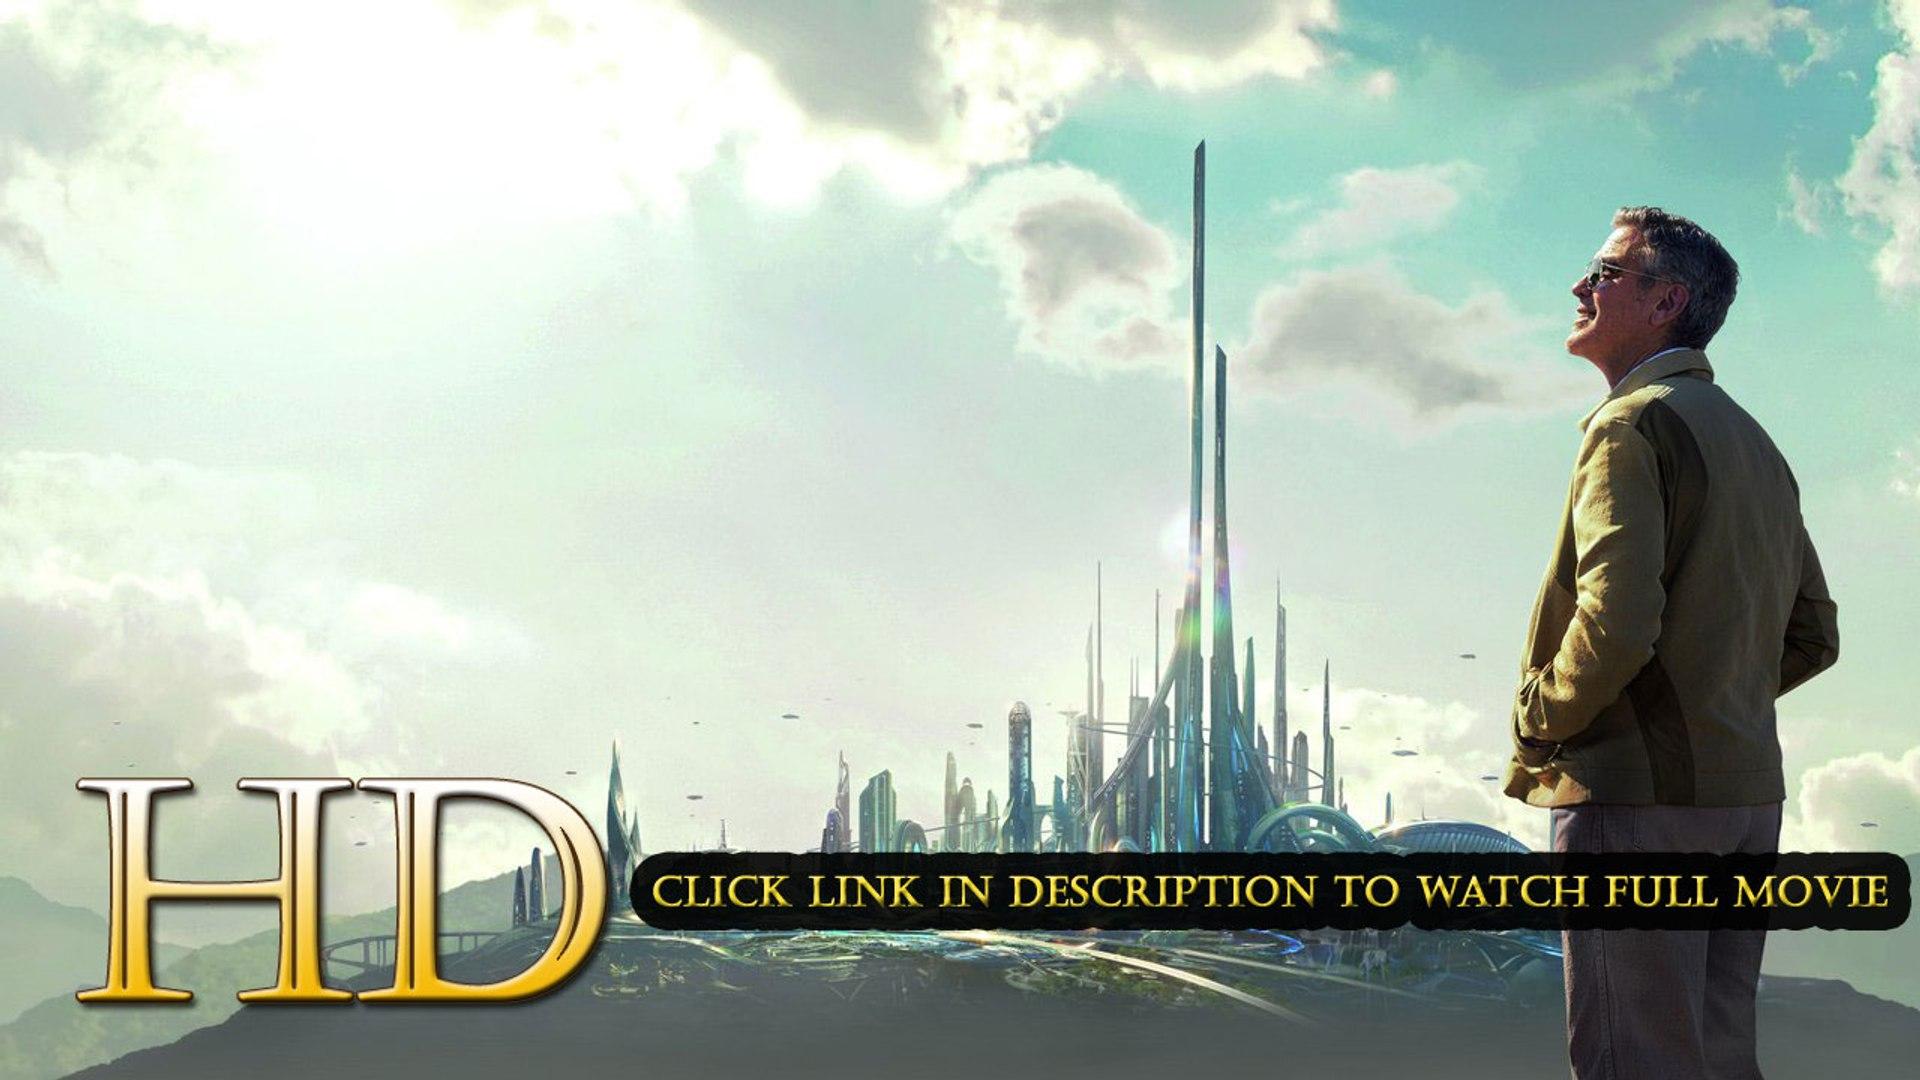 Tomorrowland 2015 Complet Movie Streaming VF en français gratuit